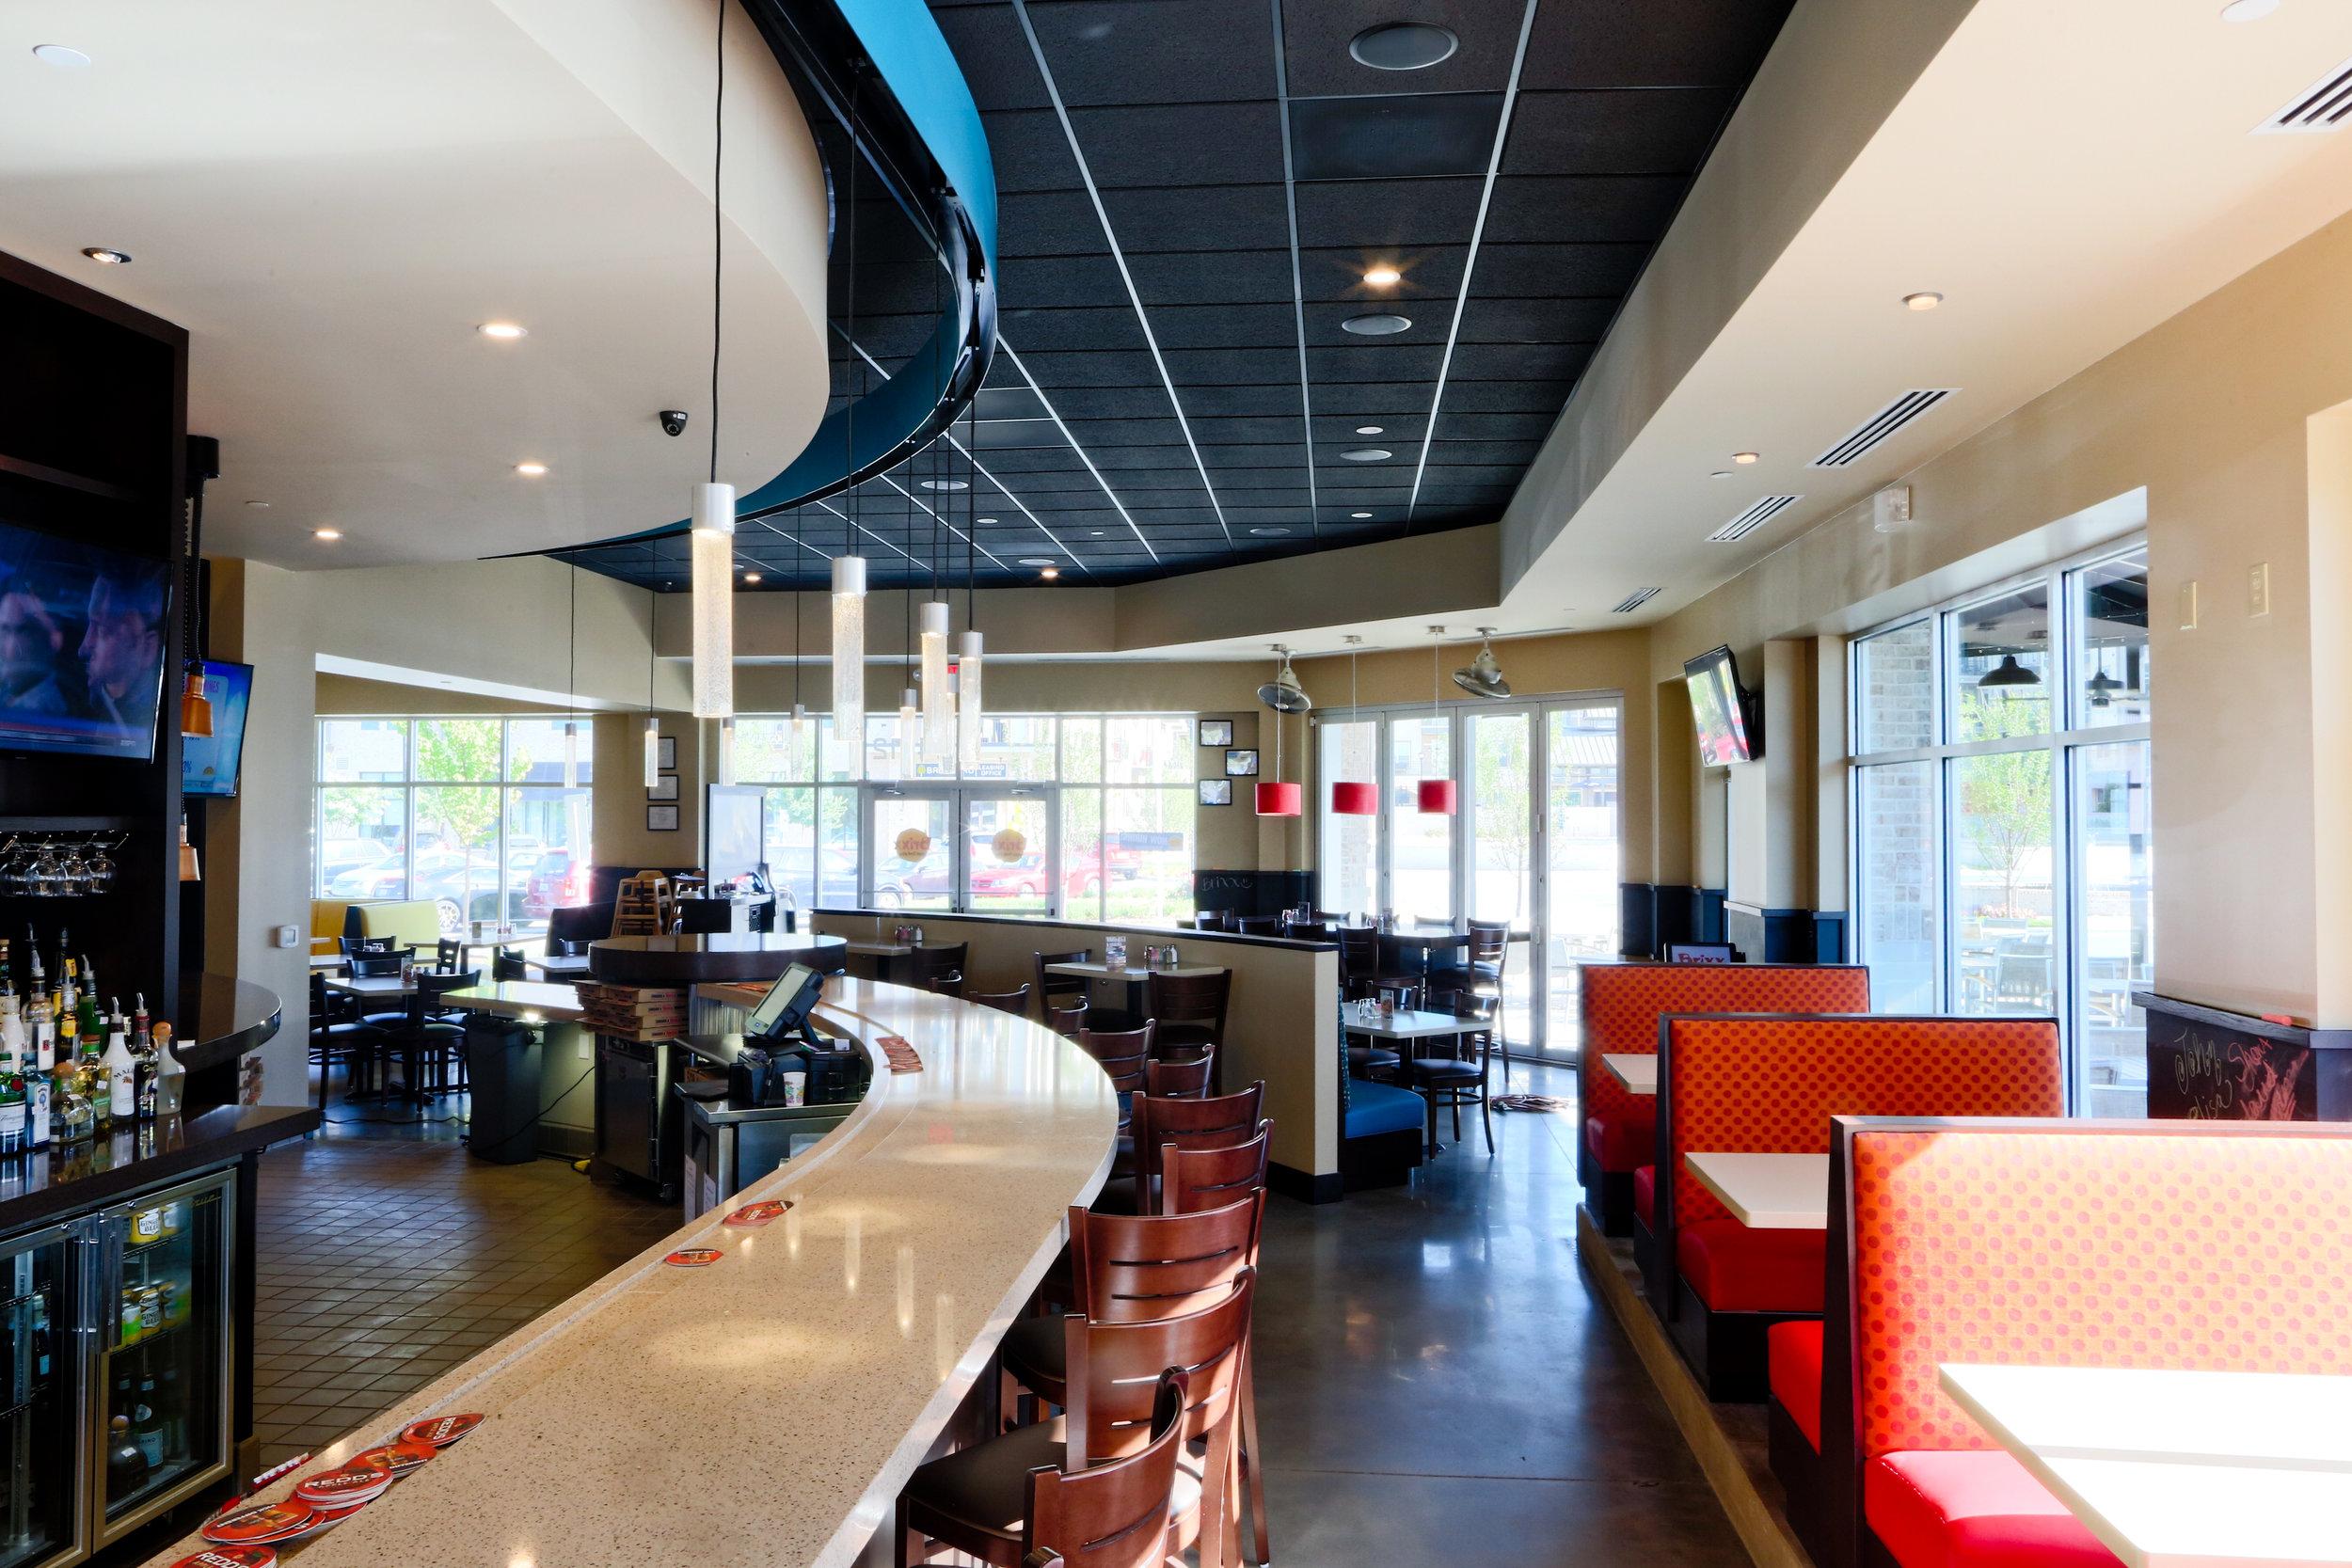 ADW-Restaurant-Brixx-Wood-Fired-Pizza-Cary-NC-Dining.JPG